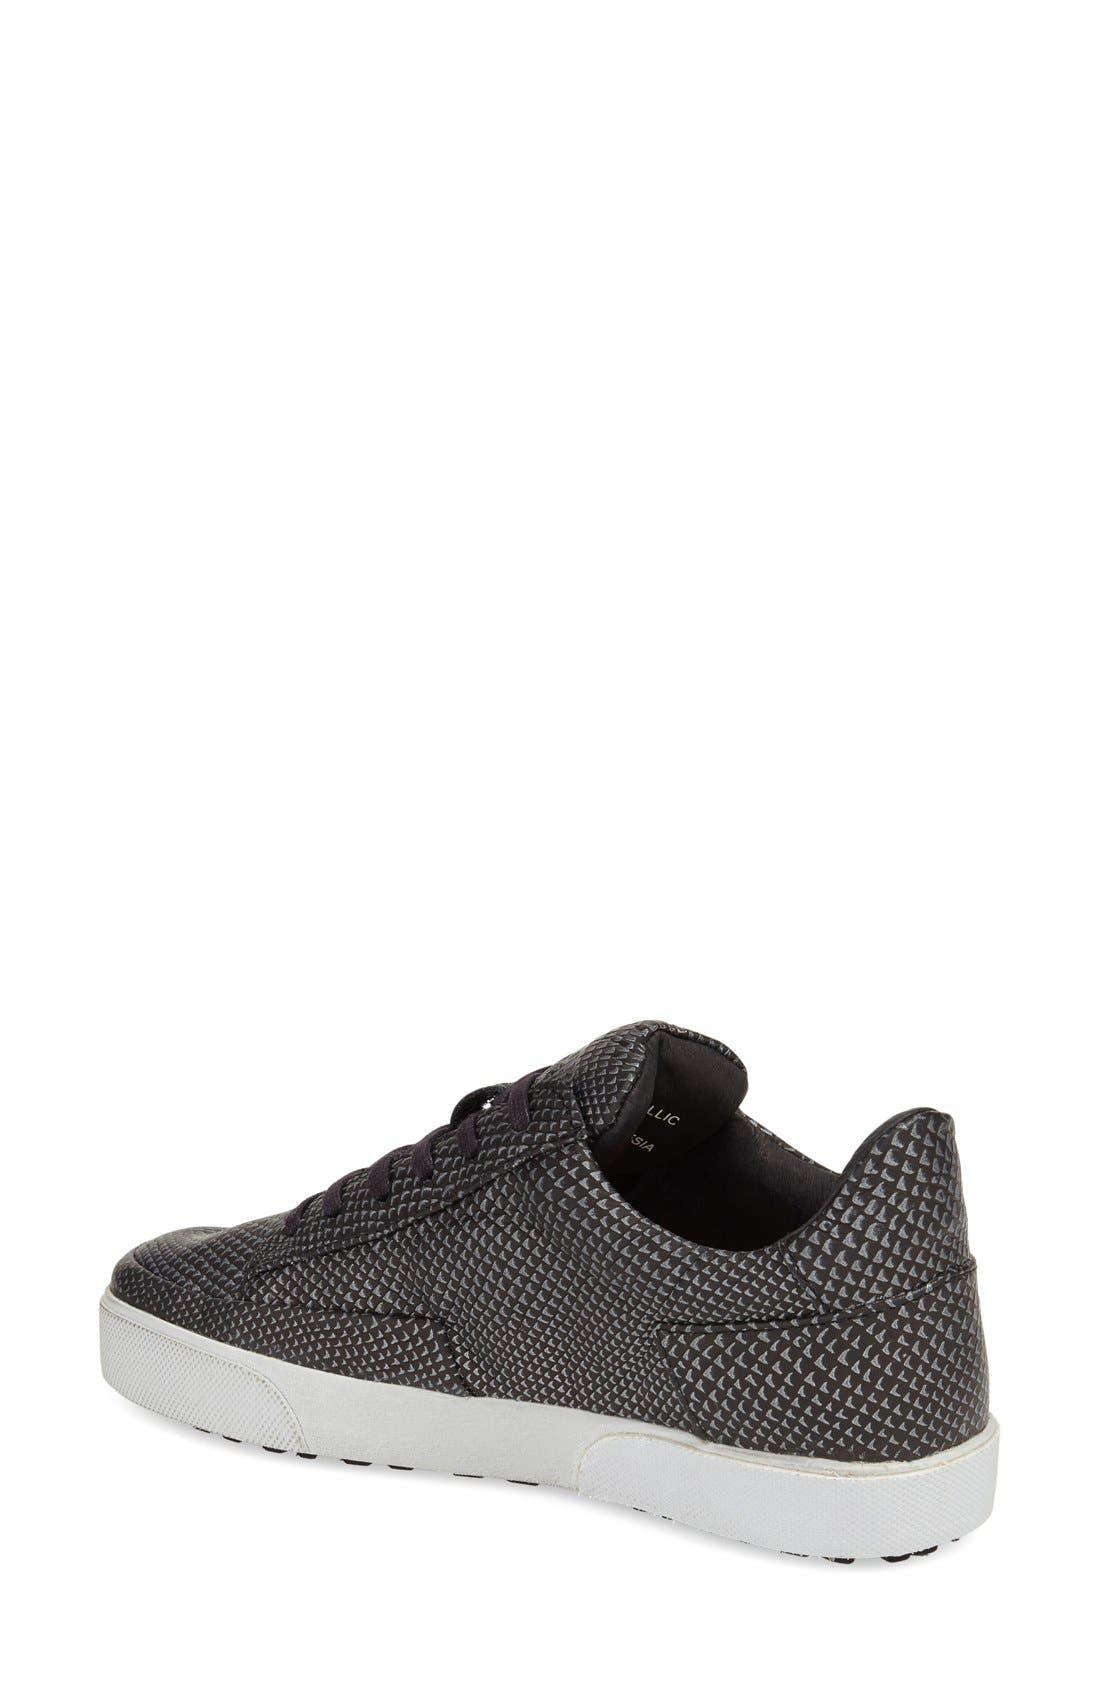 'KL51' Sneaker,                             Alternate thumbnail 2, color,                             BLACK METALLIC PRINTED LEATHER